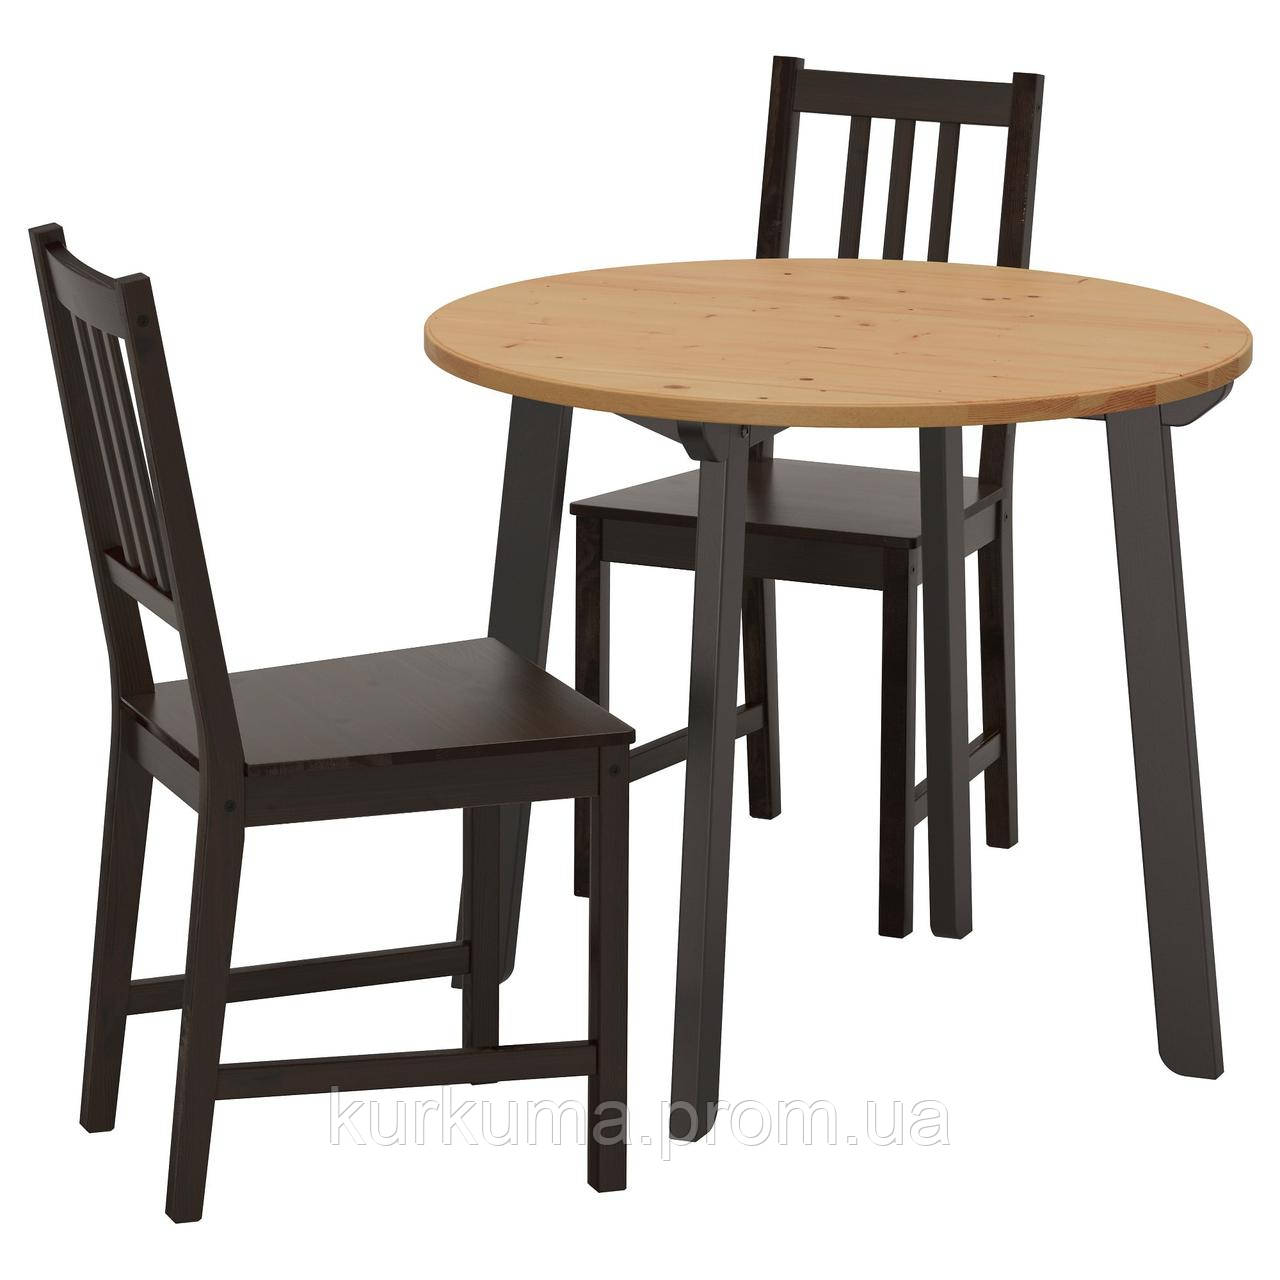 IKEA GAMLARED/STEFAN Стол и 2 стула, светлая патина пятно, коричневого цвета  (592.211.65)